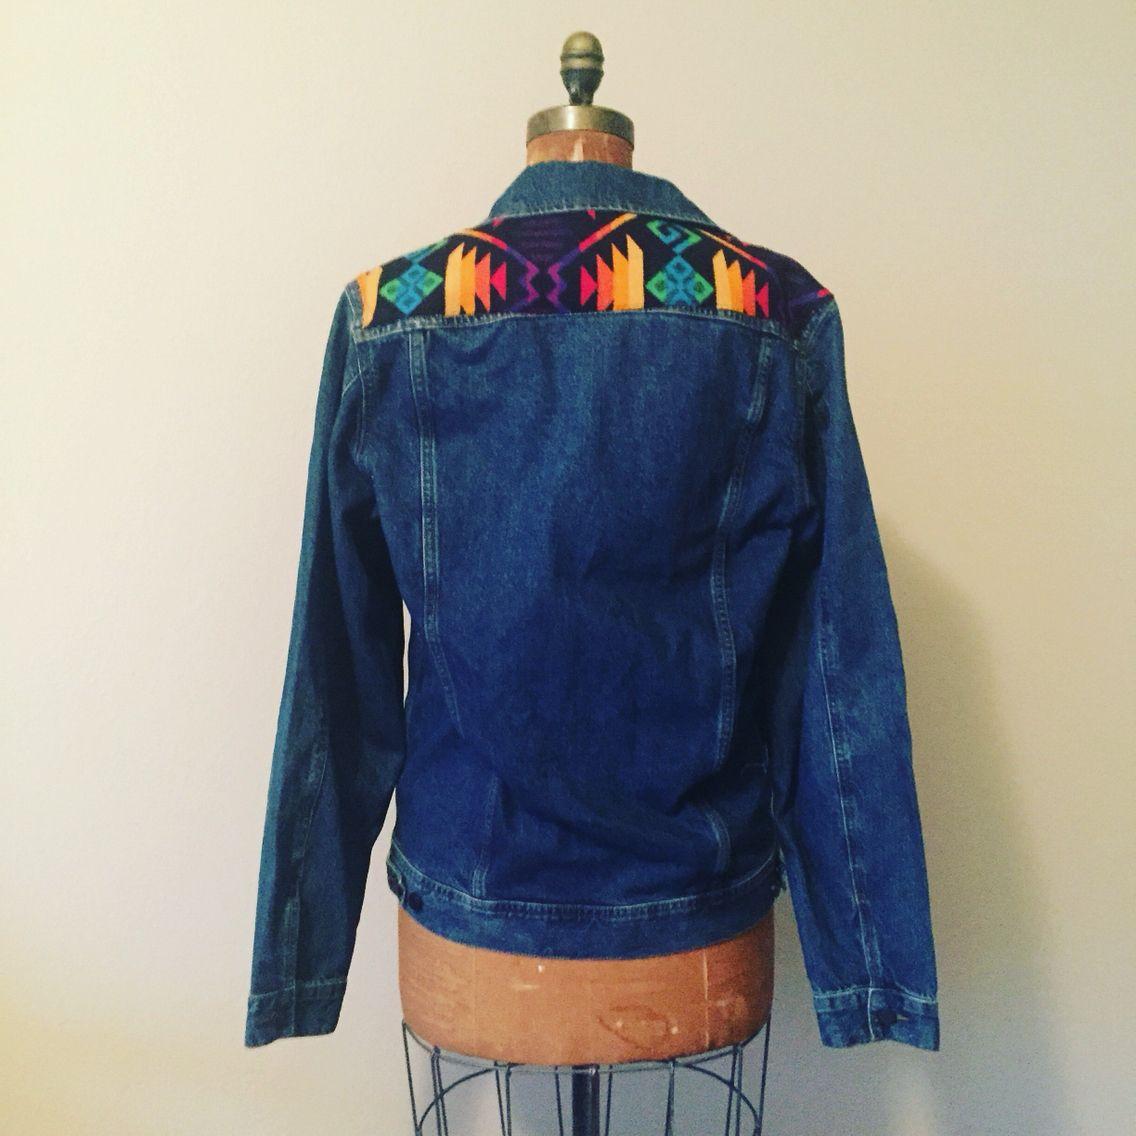 Men S Denim Jacket With Pendleton Wool Flare Instagram Customwoolies Denim Jacket Men Jackets Denim Jacket [ 1136 x 1136 Pixel ]